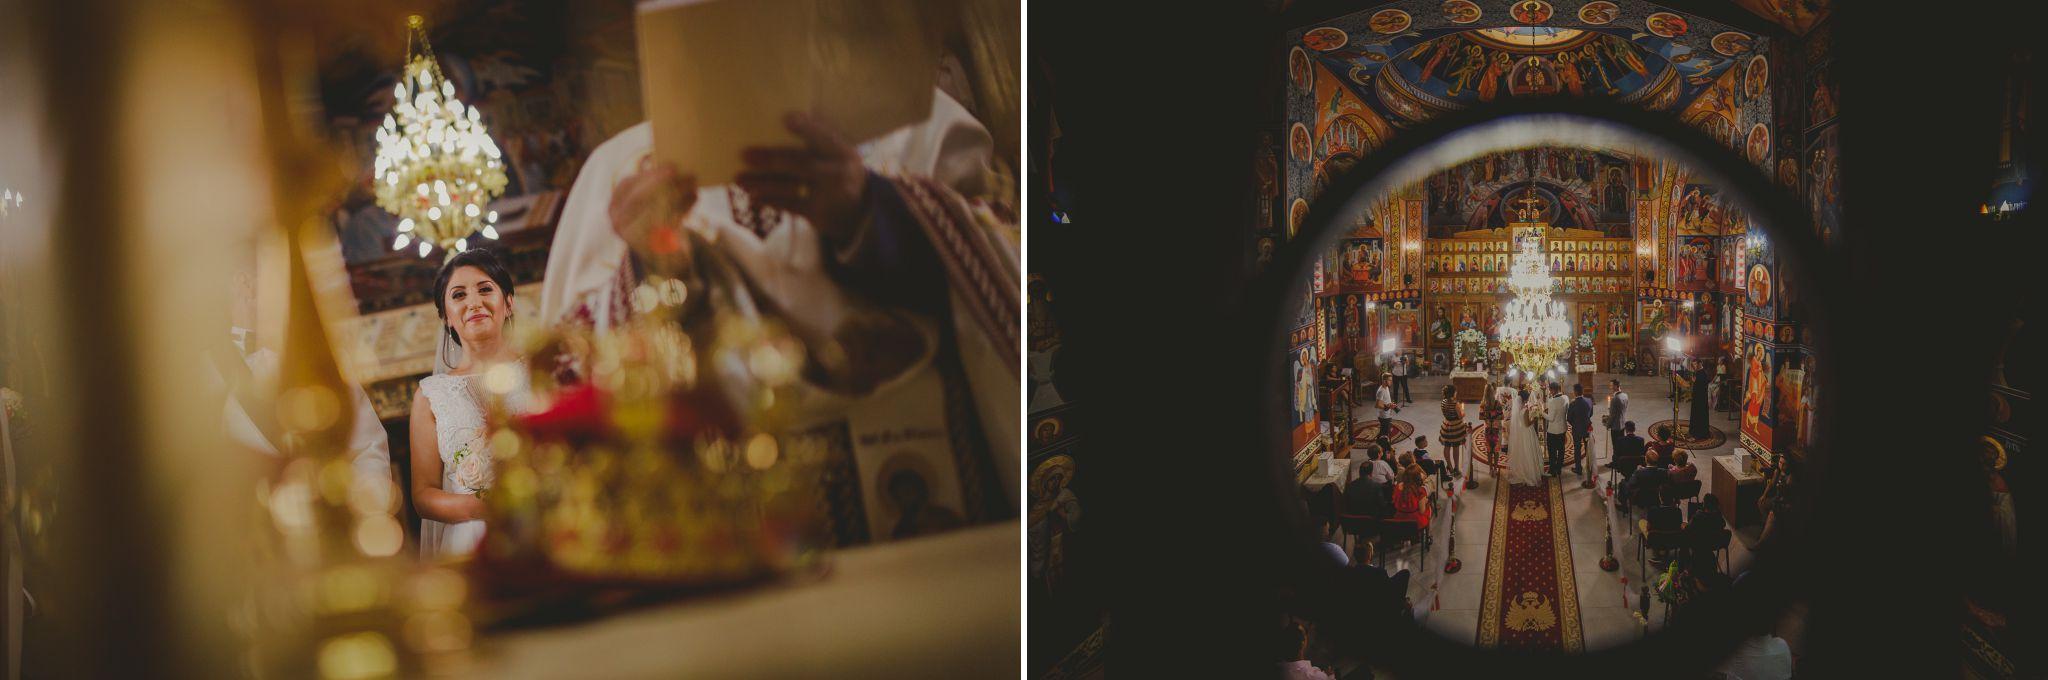 undphotography, undmedia, irina Ionescu, fotograf, fotograf constanta, fotograf profesionist constanta, fotograf nunta, fotograf nunta constanta, fotograf botez, fotograf botez constanta, fotograf familie, fotograf familie constanta, fotograf newborn, fotograf newborn constanta, fotograf maternitate, fotograf maternitate constanta, fotograf studio, fotograf studio constanta, studio foto, studio foto constanta, sedinte foto, sedinte foto constanta, trash the dress, trash the dress constanta, fotograf logodna, fotograf logodna constanta, album foto, album foto constanta, fotograf corporate, fotograf corporate constanta, fotografie eveniment, fotografie eveniment constanta, fotograf bucuresti, fotograf nunta bucuresti, fotograf brasov, fotograf nunta brasov, fotograf cluj, fotograf nunta clujalbum foto,album foto constanta,fotograf botez,fotograf botez constanta,fotograf constanta,fotograf corporate,fotograf corporate constanta,fotograf familie,fotograf familie constanta,fotograf logodna,fotograf logodna constanta,fotograf maternitate,fotograf maternitate constanta,fotograf newborn,fotograf newborn constanta,fotograf nunta,fotograf nunta constanta,fotograf profesionist constanta,fotograf studio,fotograf studio constanta,fotograf;,fotografie eveniment,fotografie eveniment constanta,sedinte foto,sedinte foto constanta,studio foto,studio foto constanta,trash the dress,trash the dress constanta,UndPhotographyfotograf constanta, fotograf braila, fotograf tulcea, fotograf buzau, fotograf galati, fotograf slobozia, fotograf calarasi, fotograf mangalia, fotograf bucuresti, fotograf nunta constanta, fotograf nunta braila, fotograf nunta tulcea, fotograf nunta buzau, fotograf nunta galati, fotograf nunta slobozia, fotograf nunta calarasi, fotograf nunta mangalia, fotograf nunta bucuresti,fotograf botez, fotograf botez constanta, fotograf botez slobozia, fotograf botez calarasi, fotograf botez tulcea, fotograf botez galati, fotograf botez braila, fotograf botez mangalia, fotograf